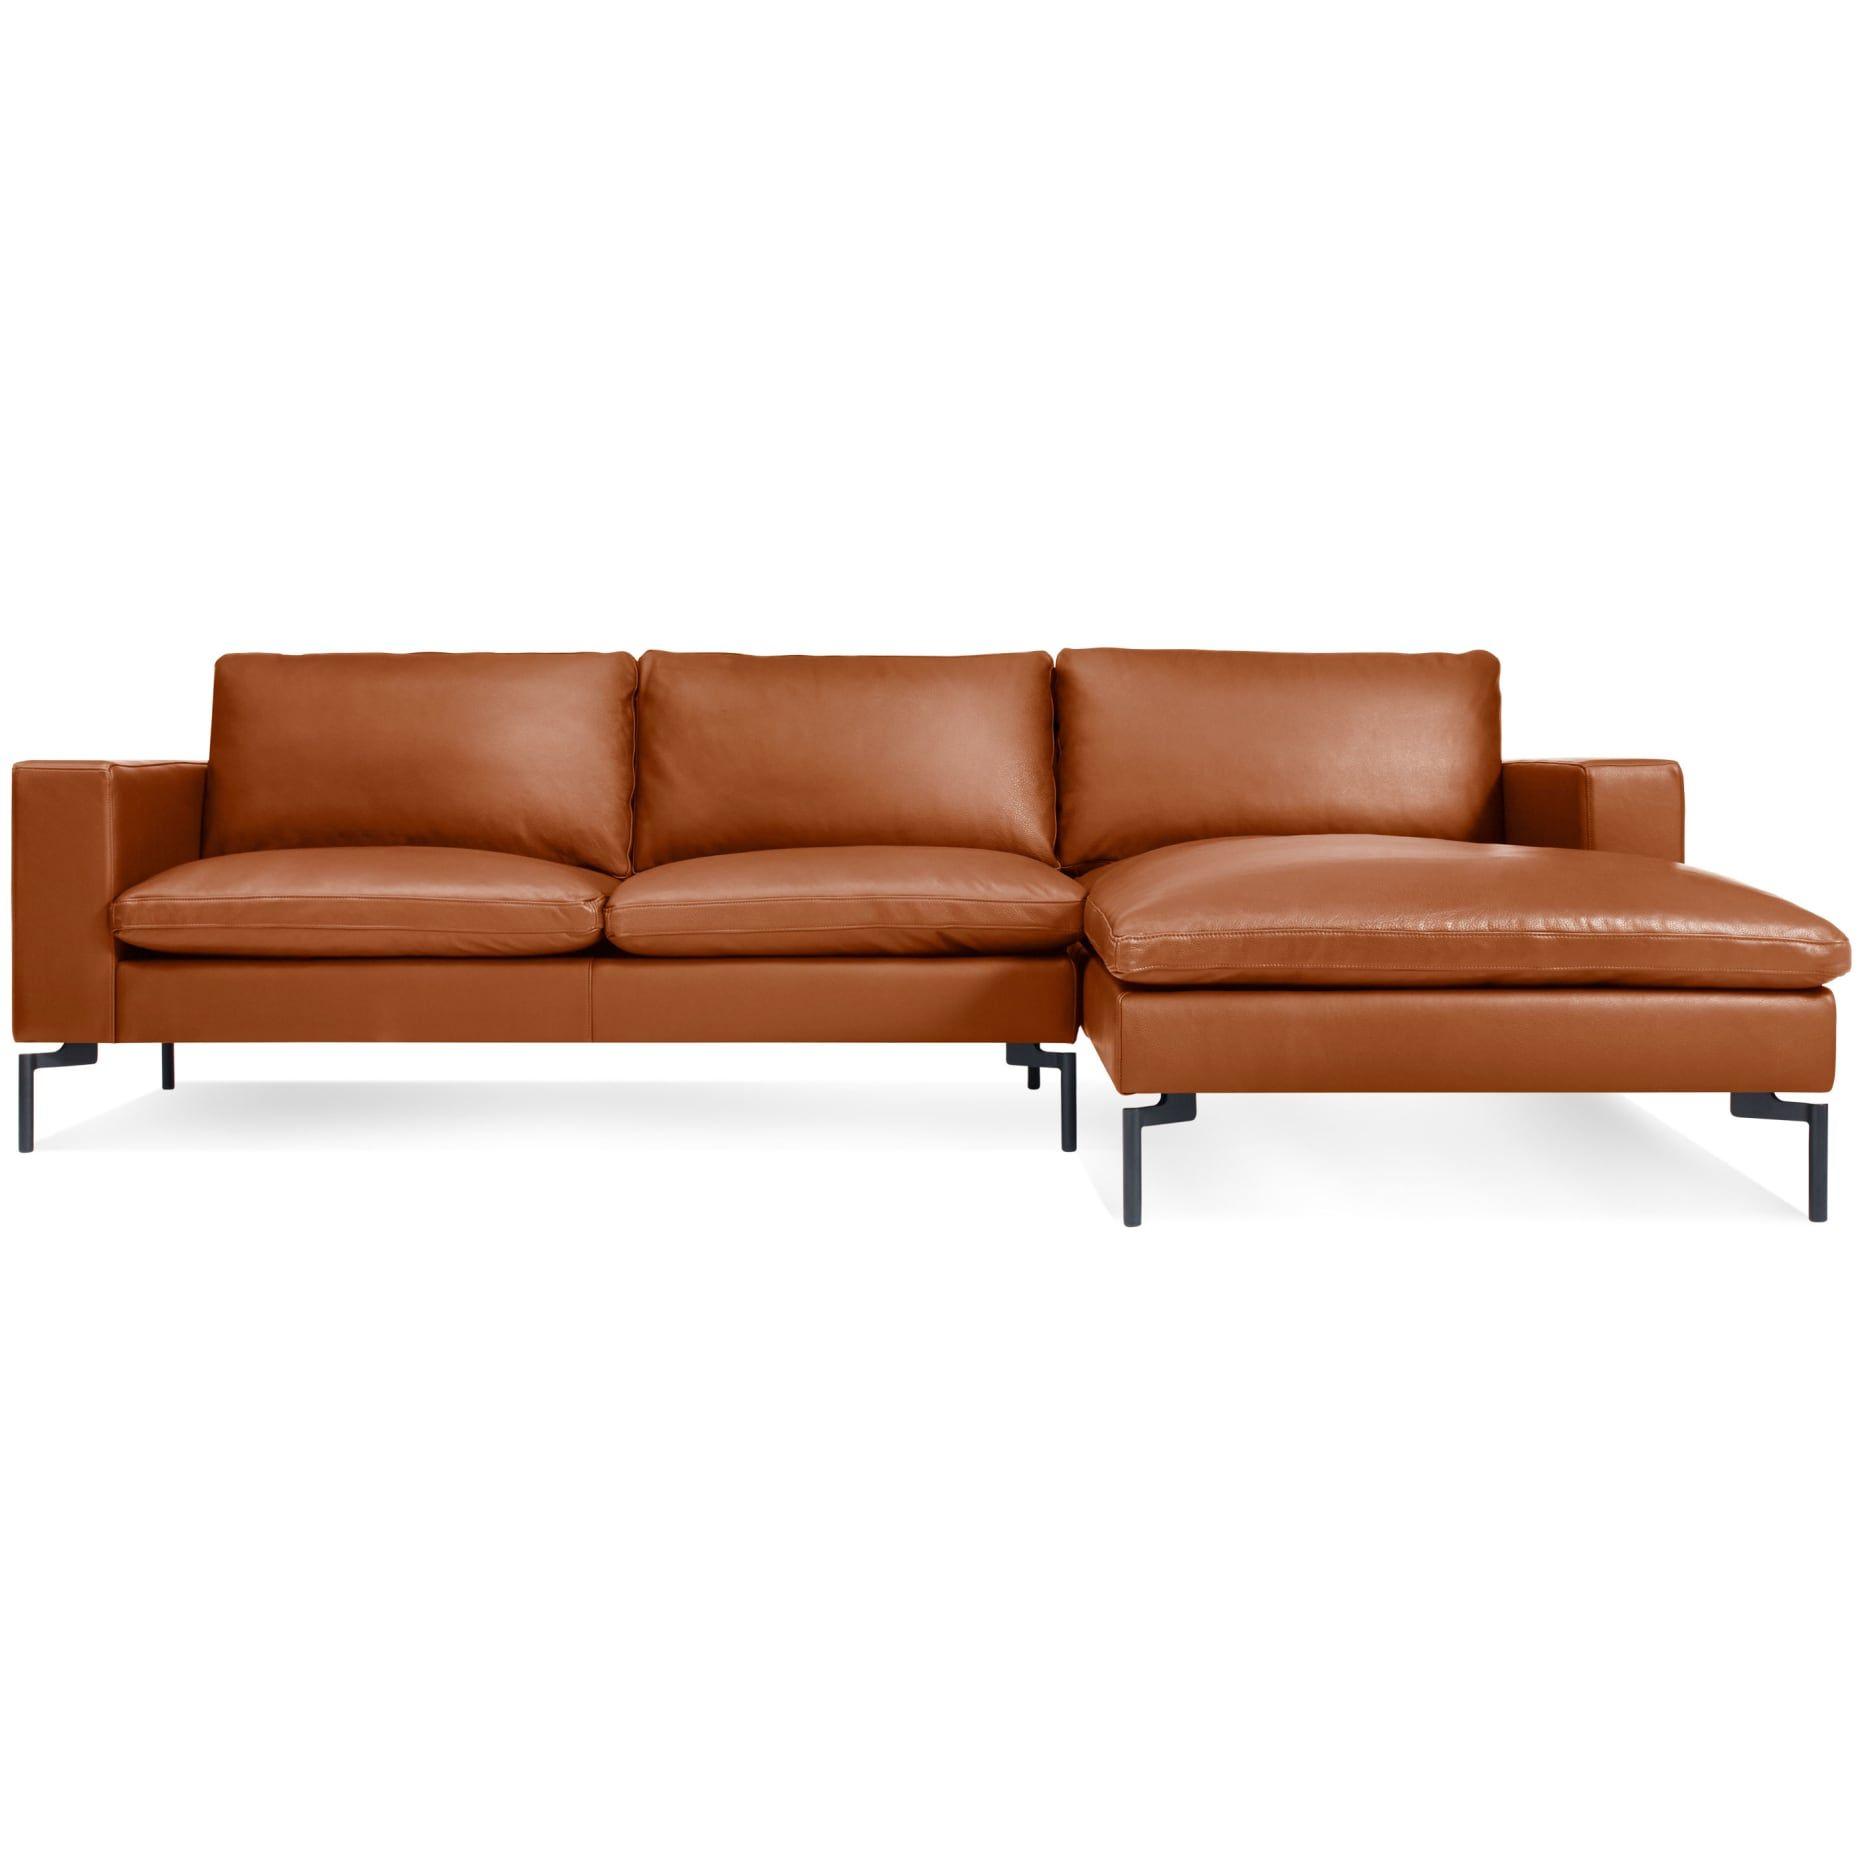 New Standard Leather Sofa W Chaise Leather Sofa Sofa Small Sectional Sofa